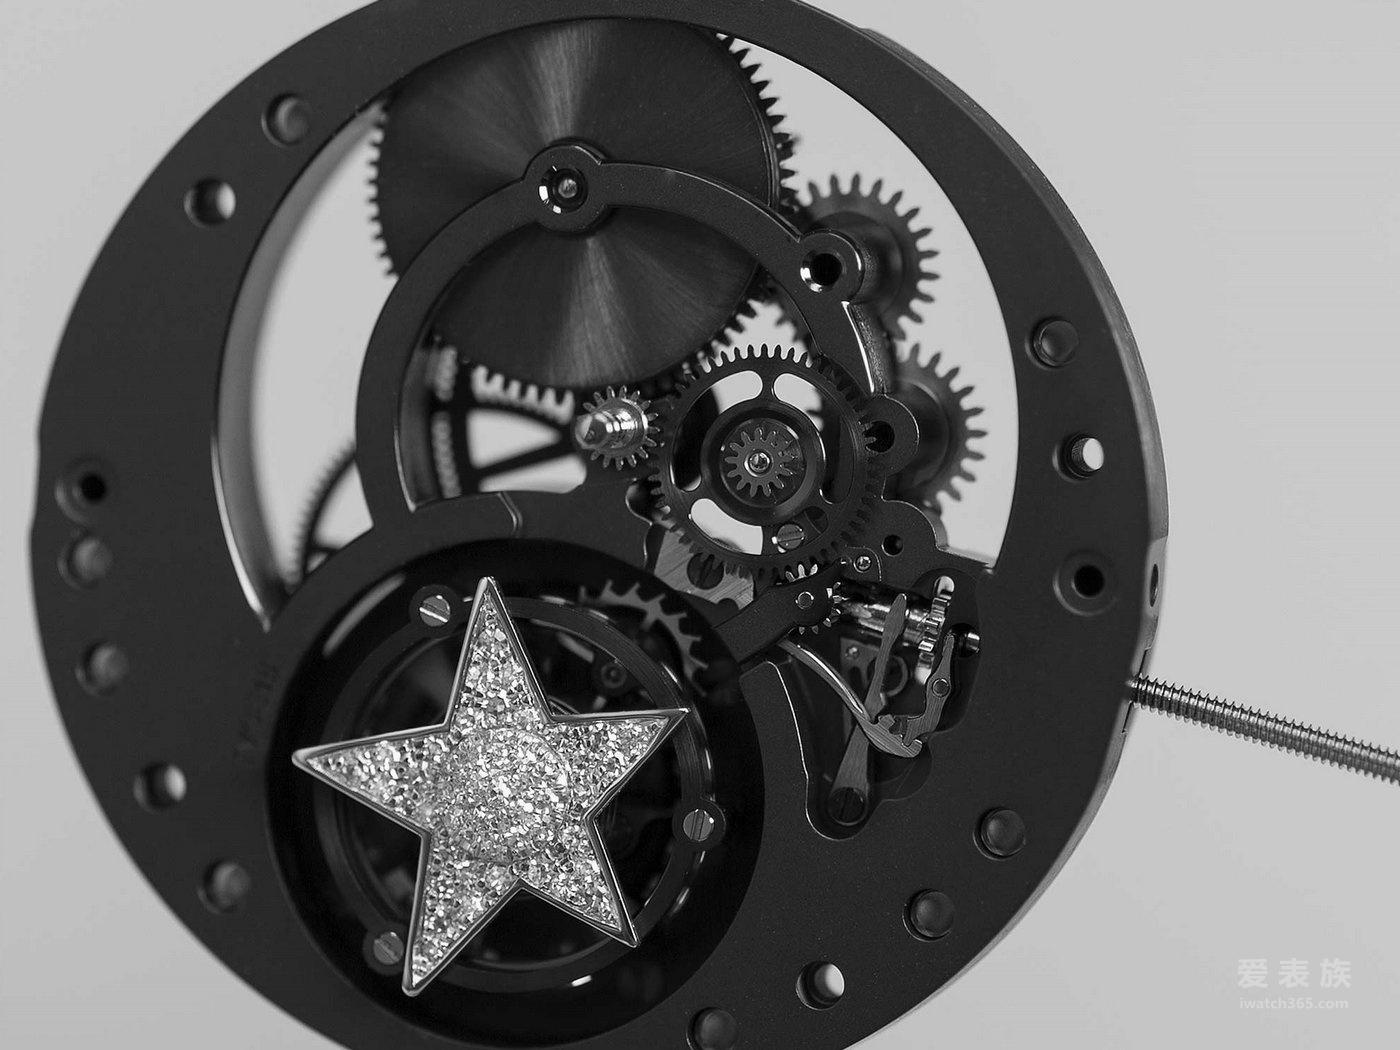 Chanel 2015 Pre-Basel 新表预览 J12镂空浮动式陀飞轮腕表